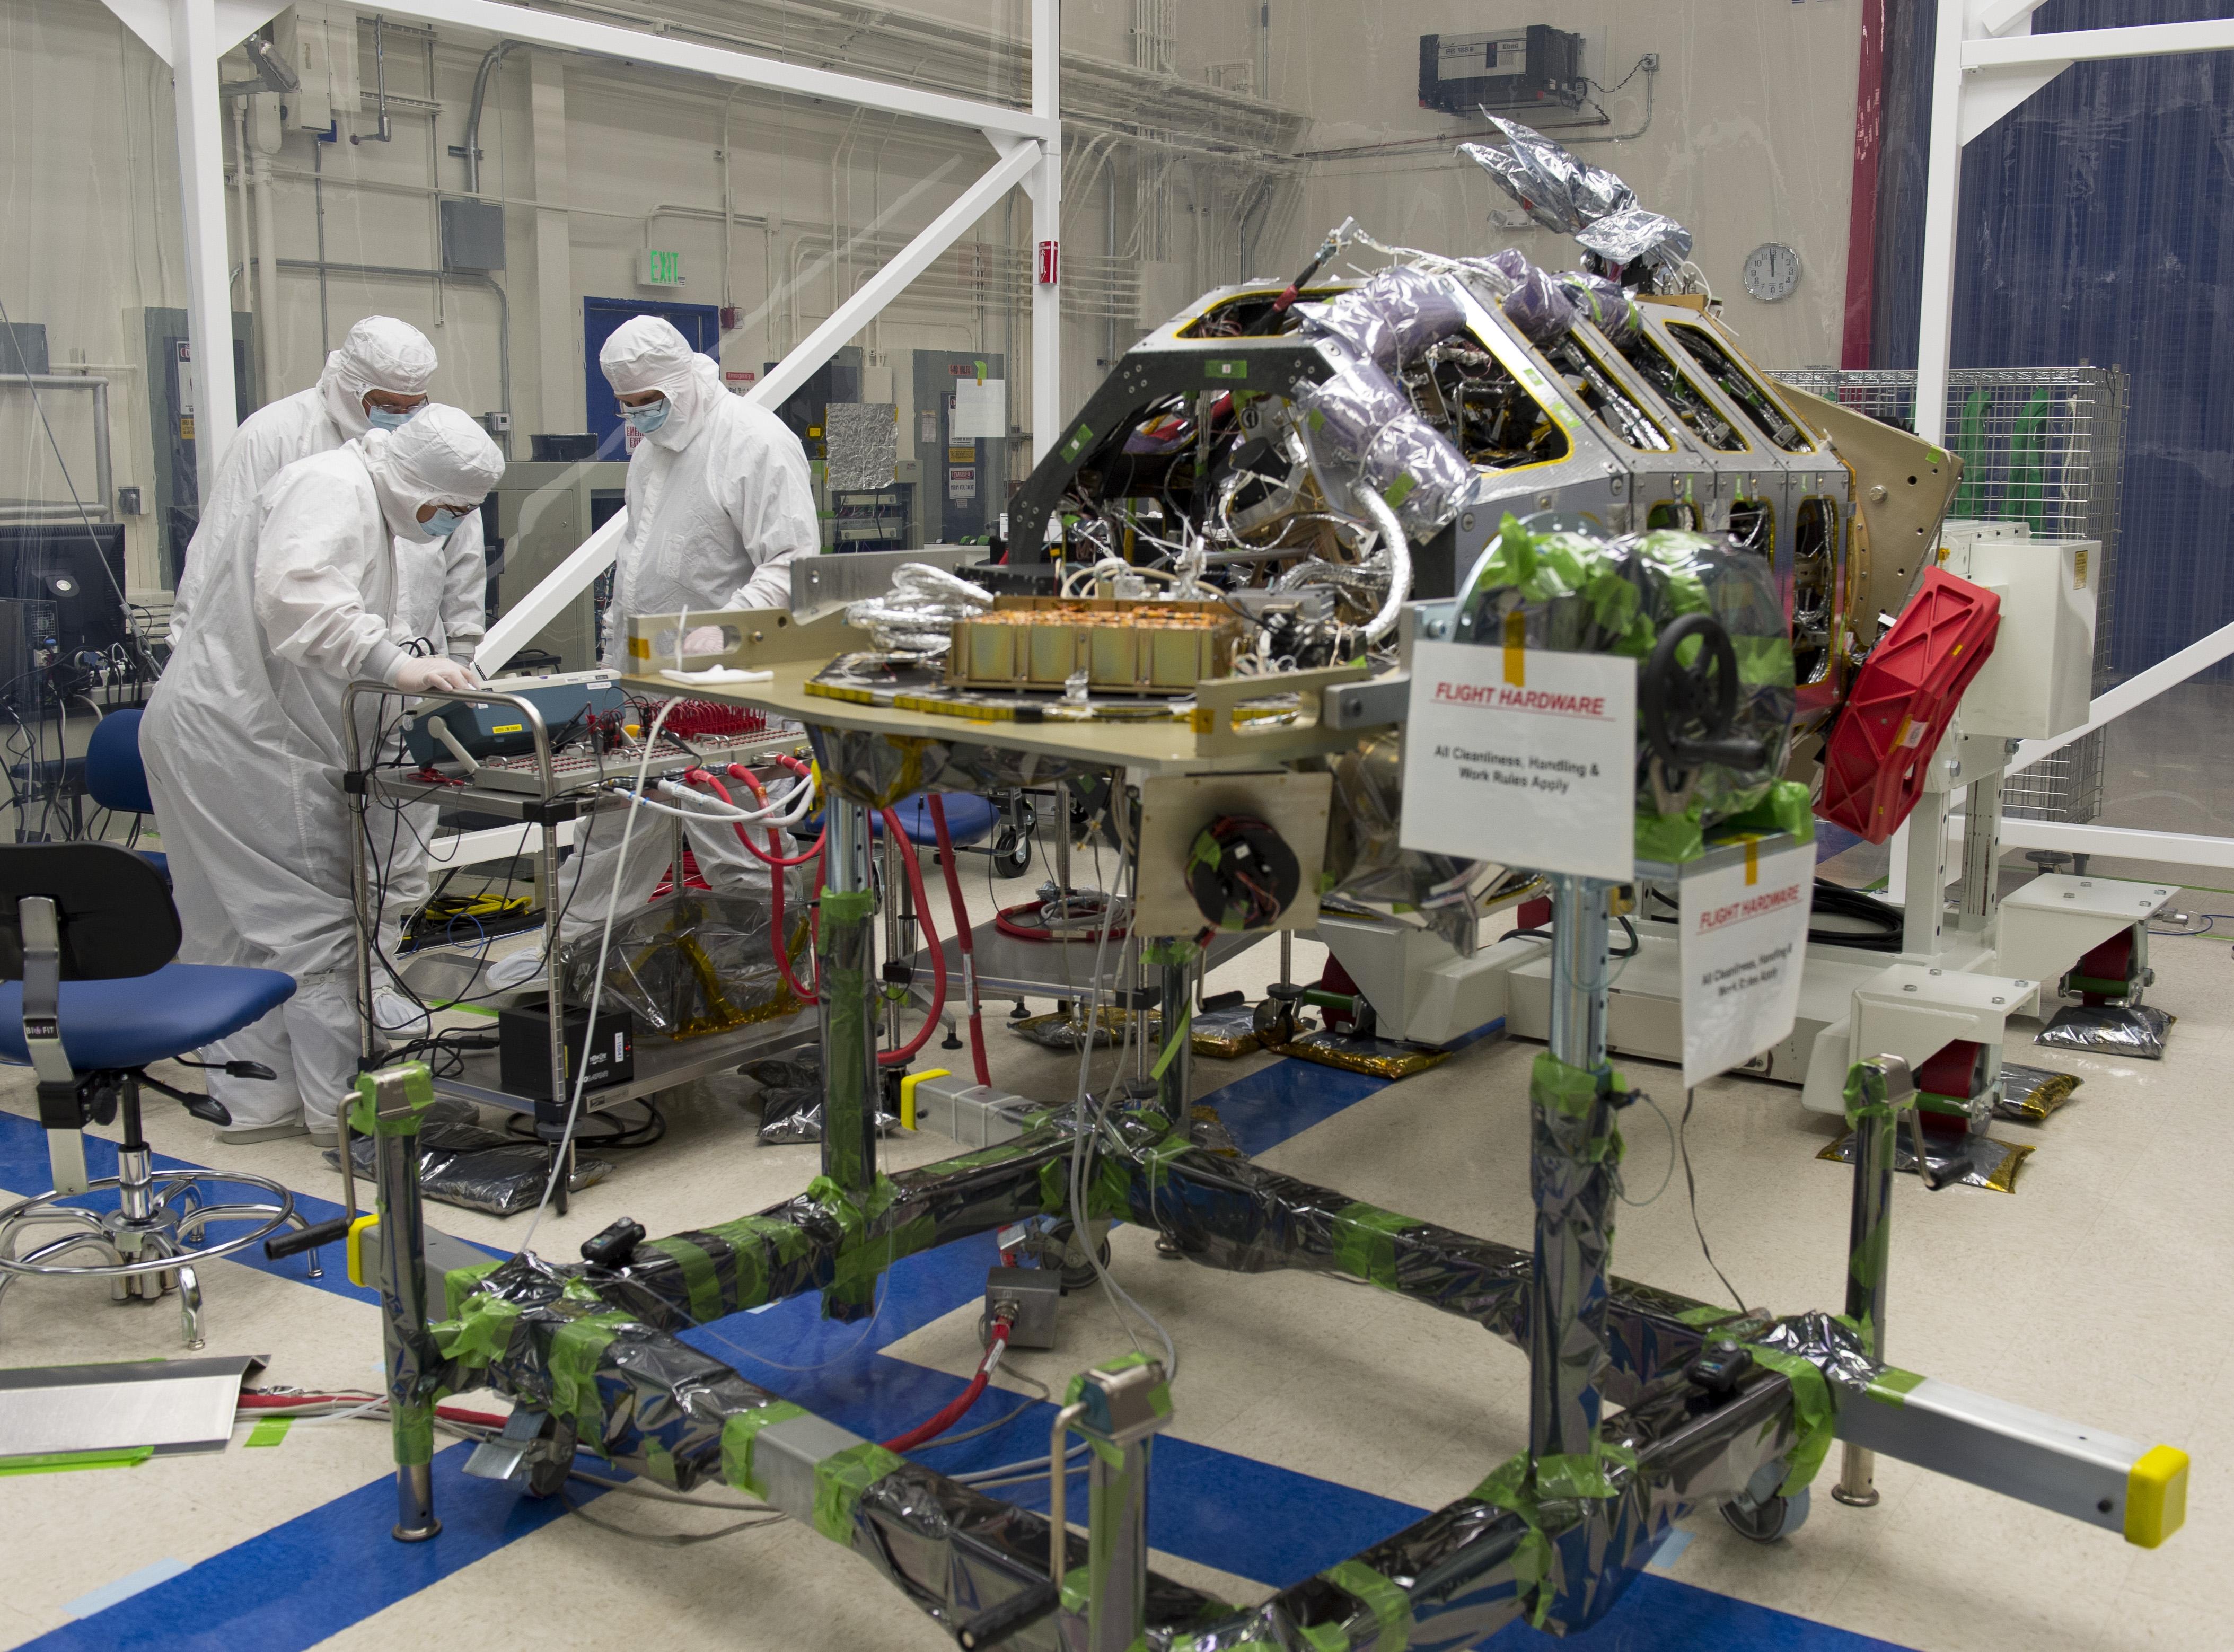 LADEE Thermal Vacuum Preparation   NASA